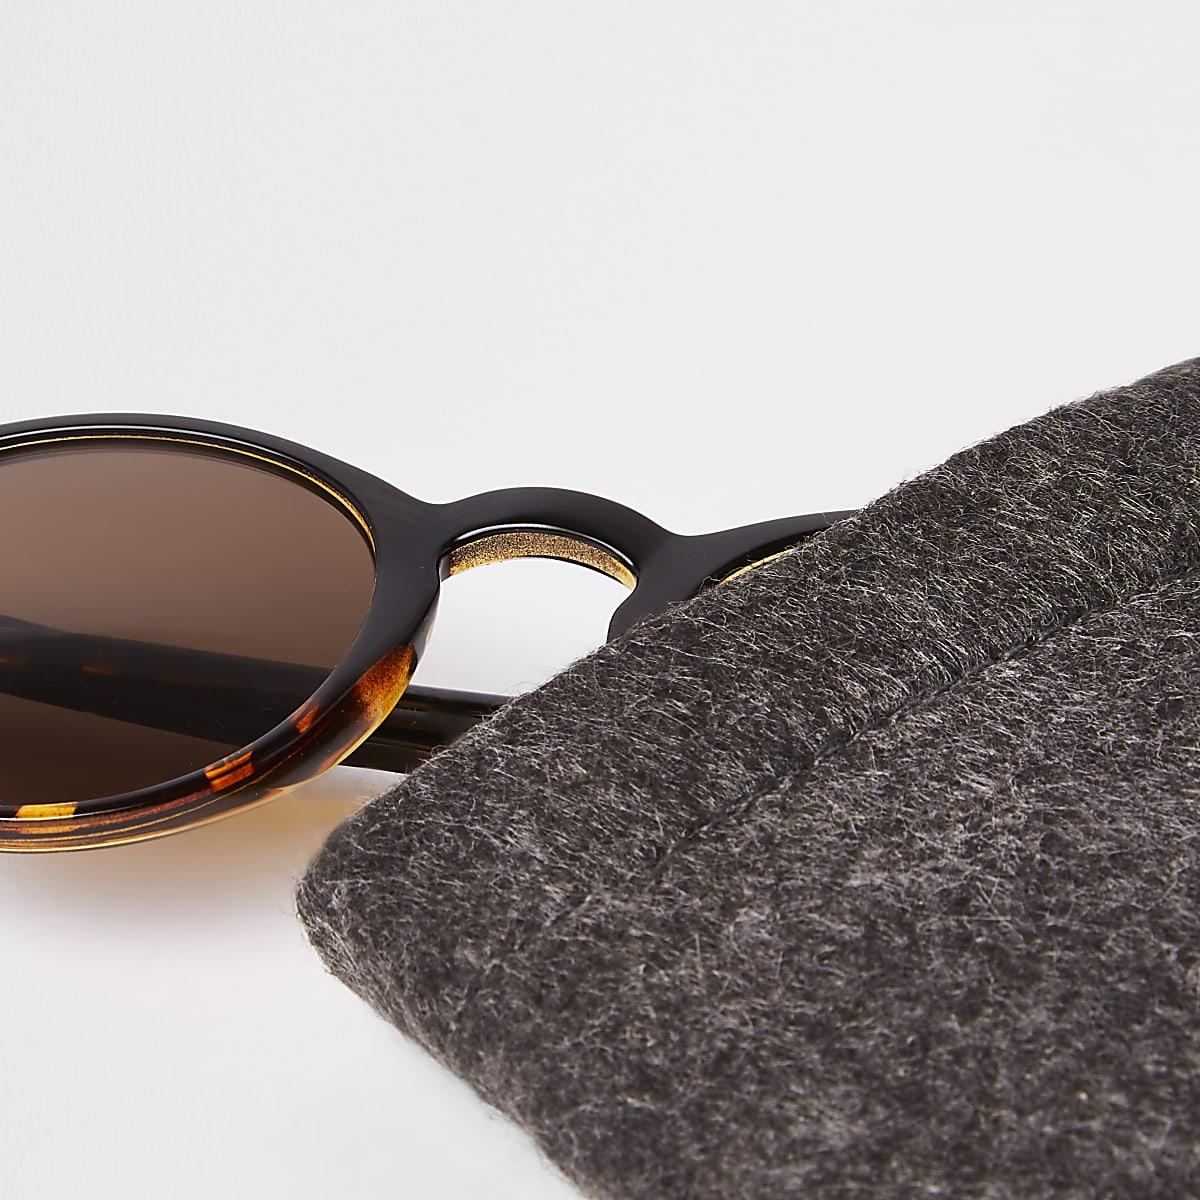 ae5f53d88d0846 Selected Homme - Bruine zonnebril met ronde glazen - Ronde ...